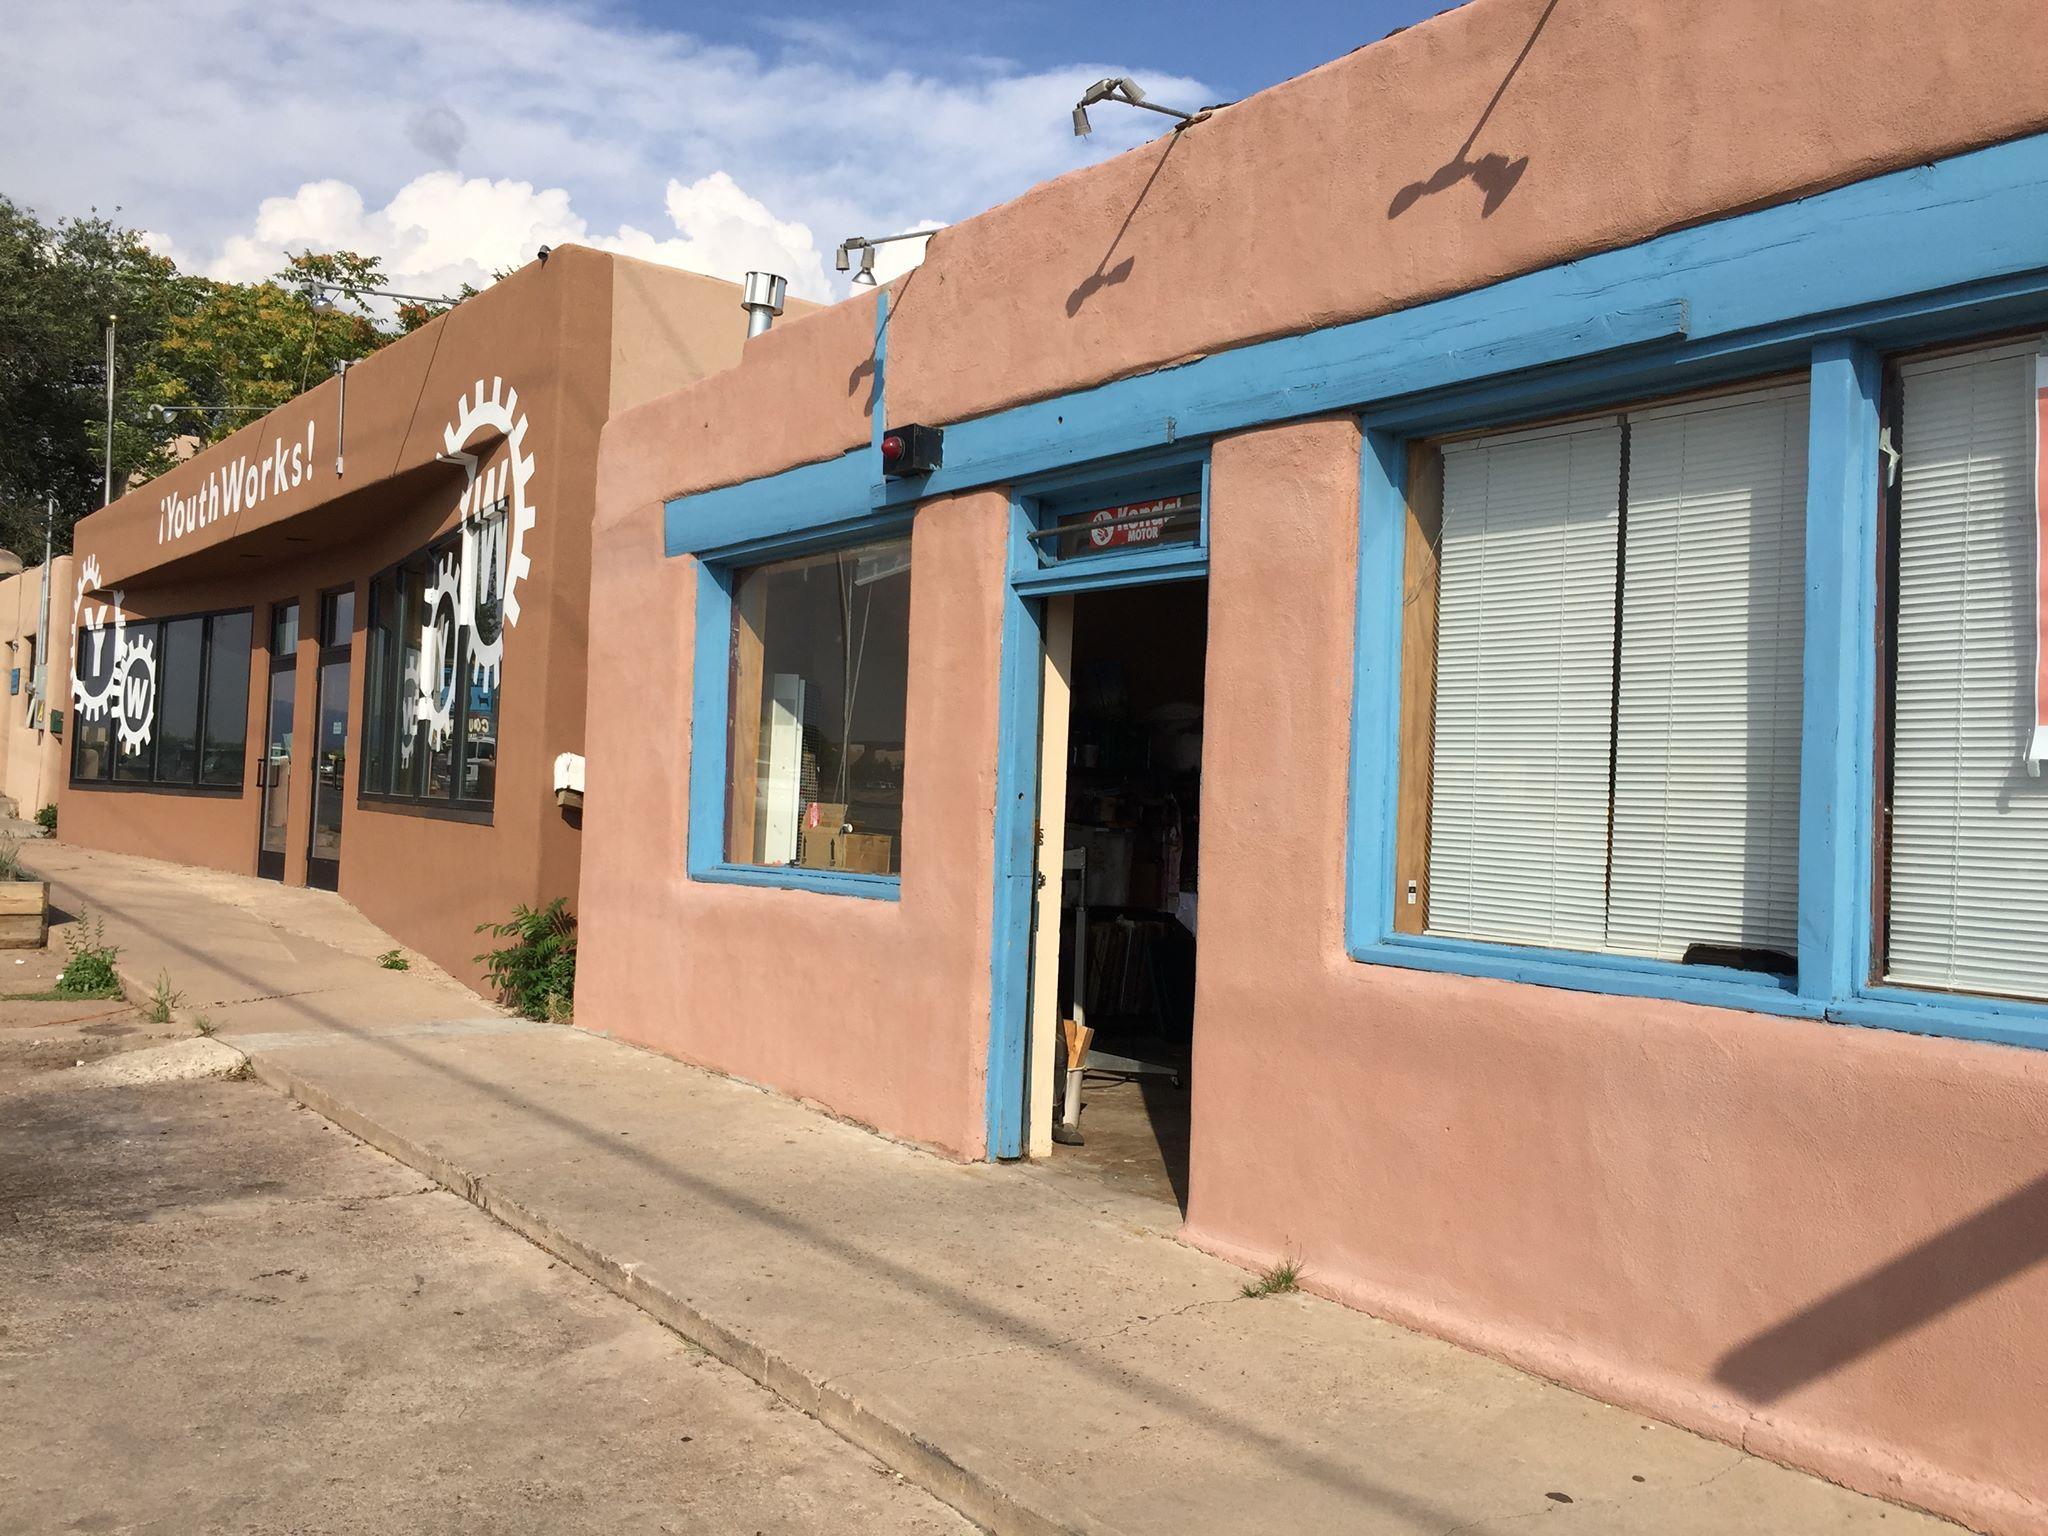 The new home of Santa Fe Community Screenprinting.